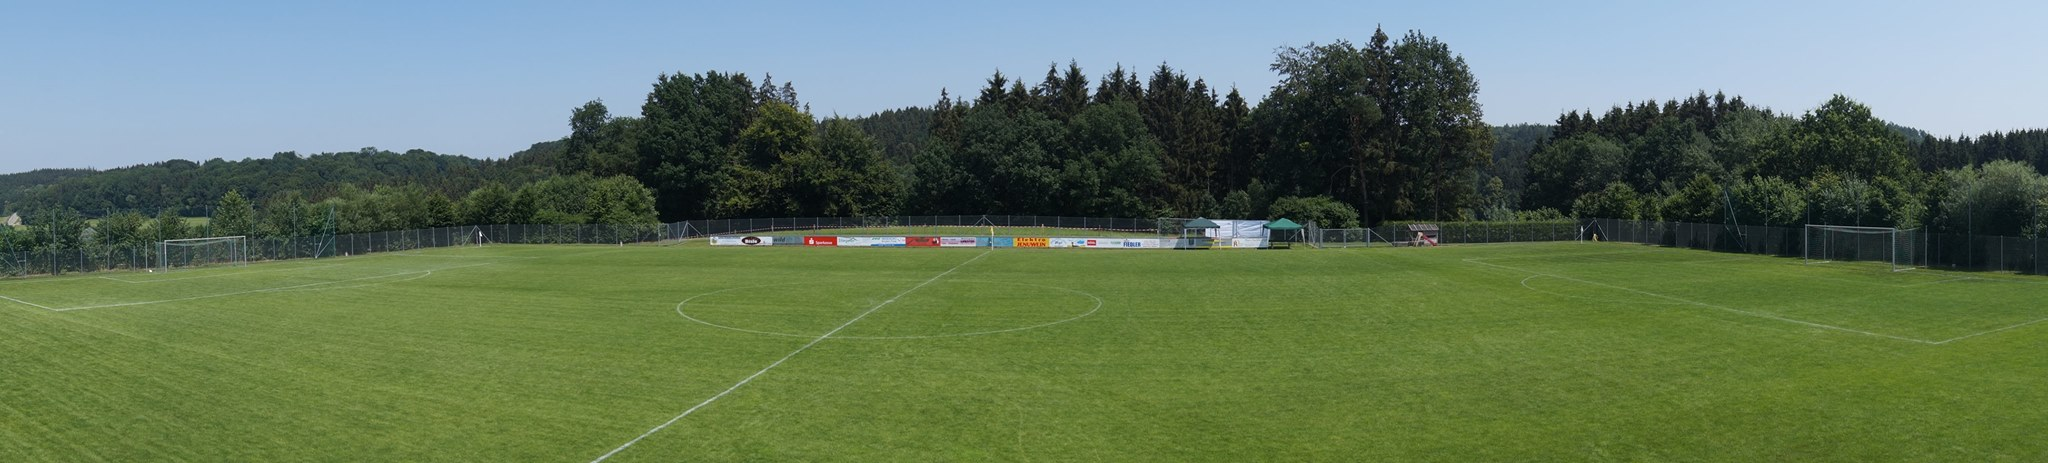 Sportplatz_neu1